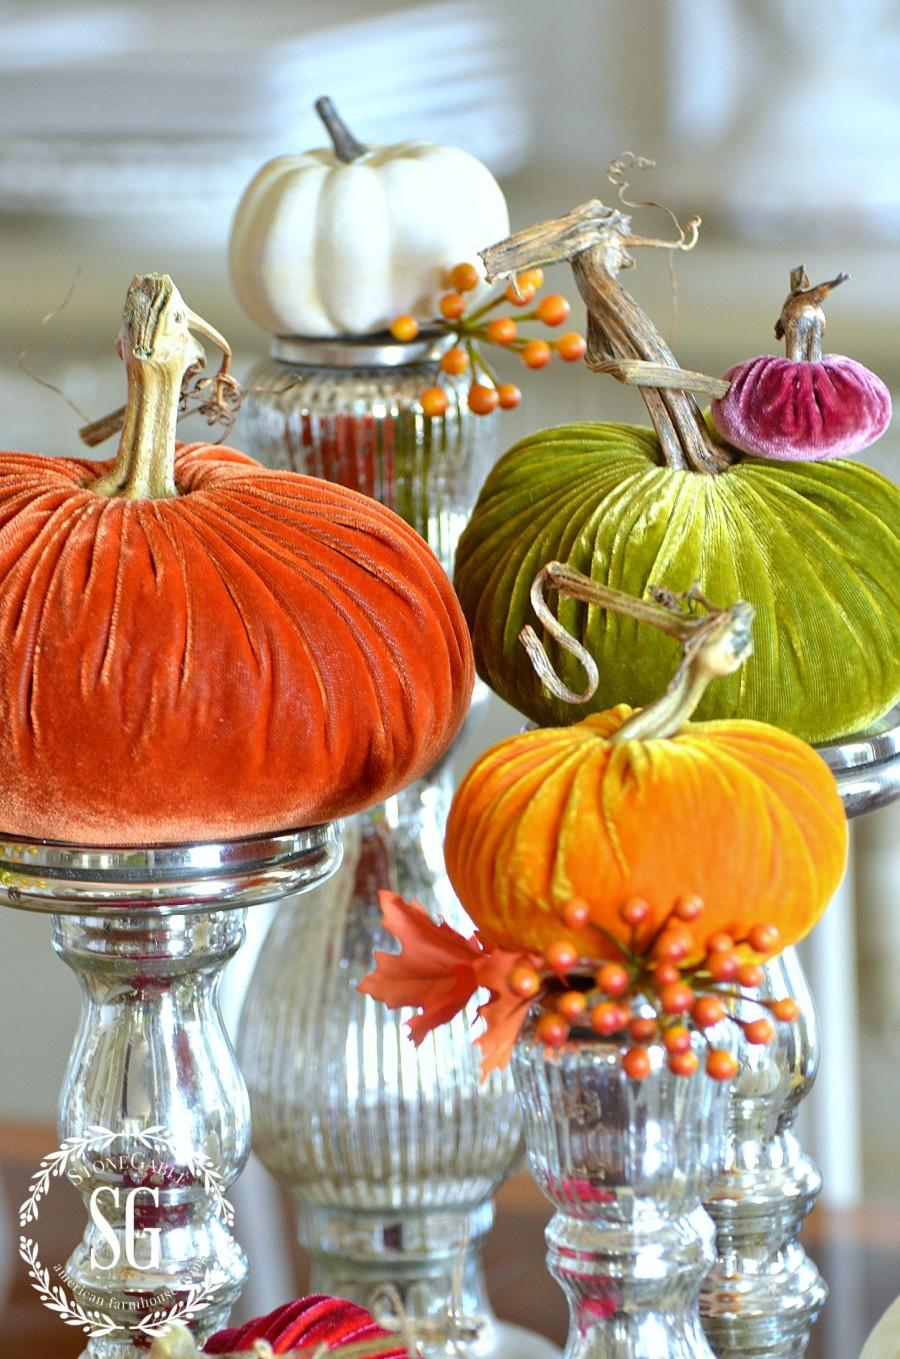 5 BEAUTIFUL WAYS TO STYLE PUMPKINS-pumpkins-candlesticks- stonegableblog.com